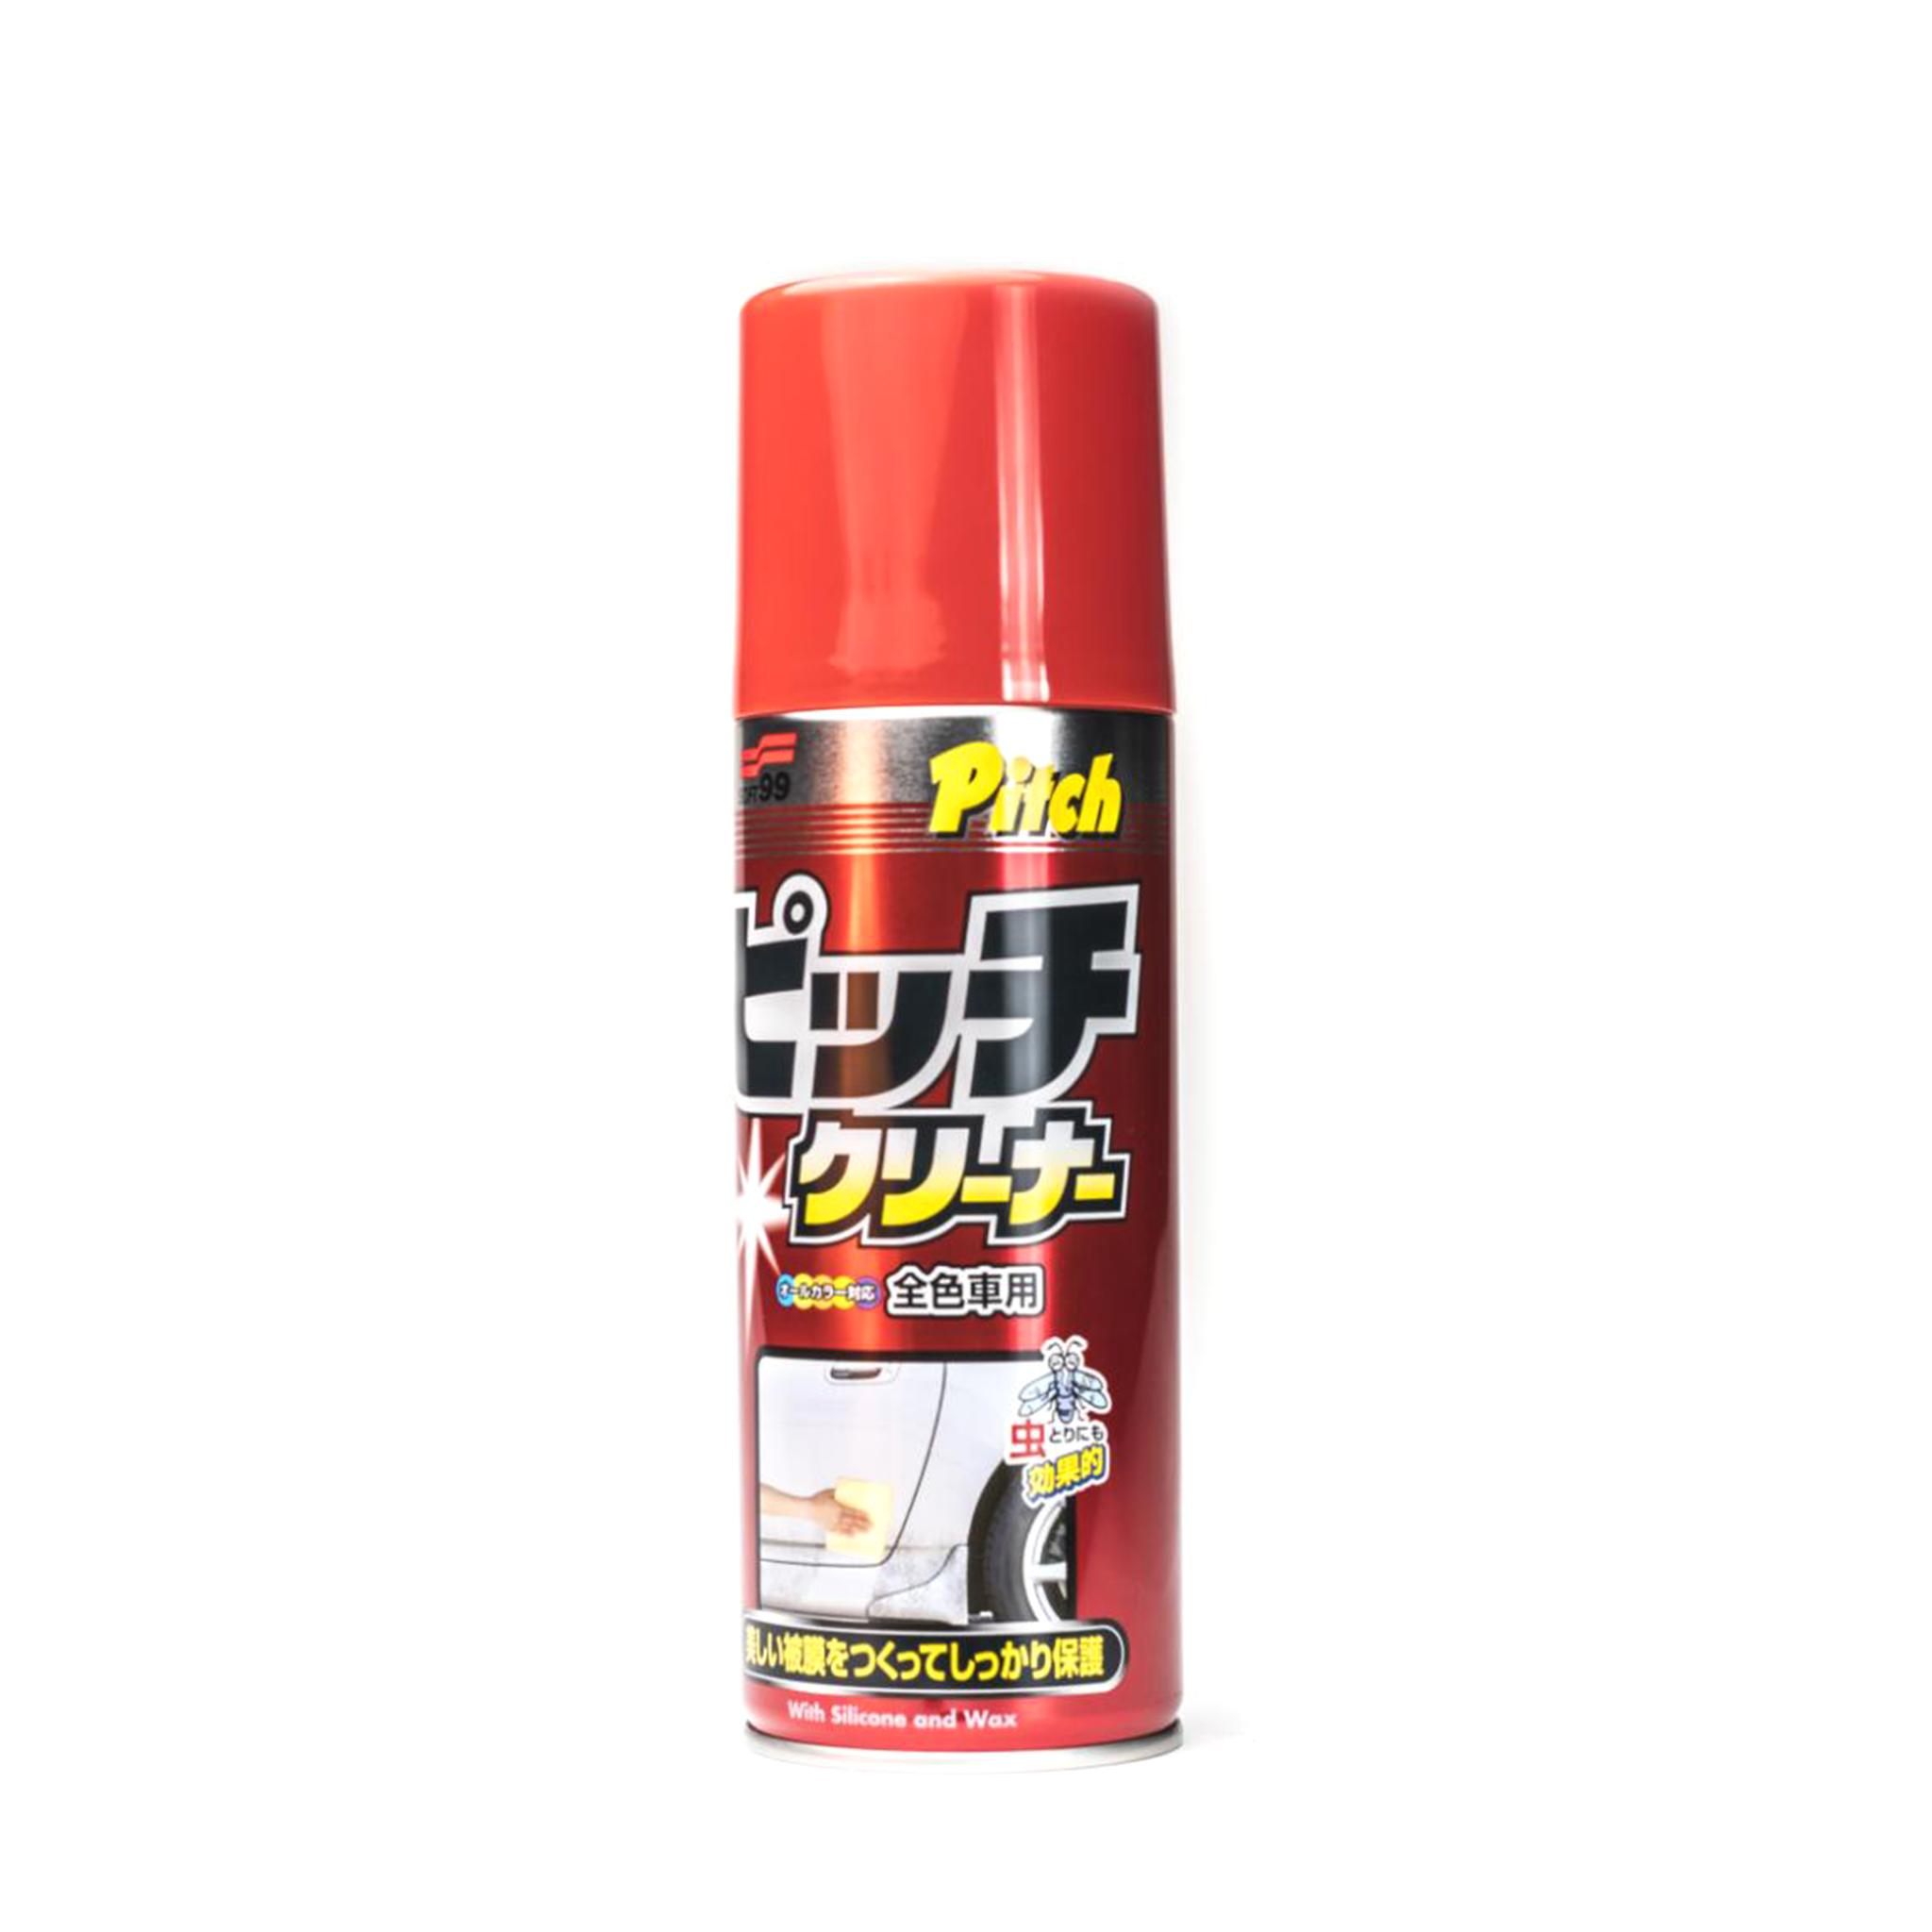 Tjärlösare Soft99 New Pitch Cleaner, 420 ml